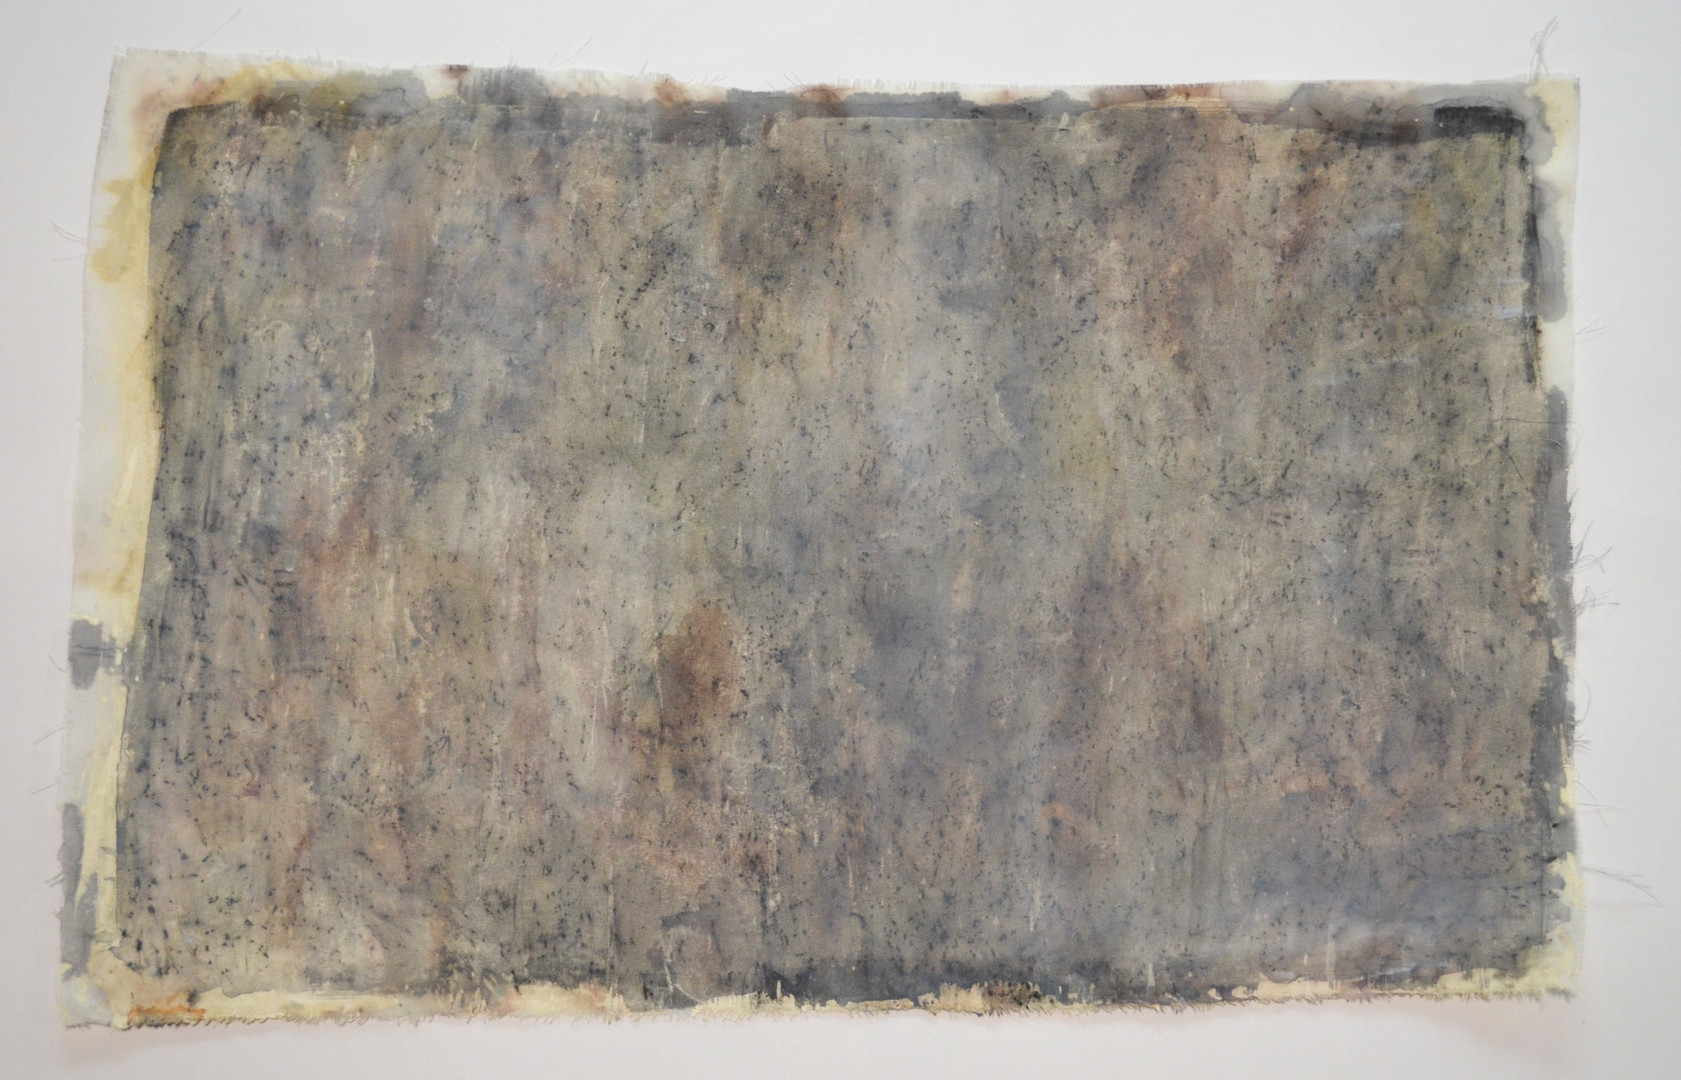 drywall painting II (2017)